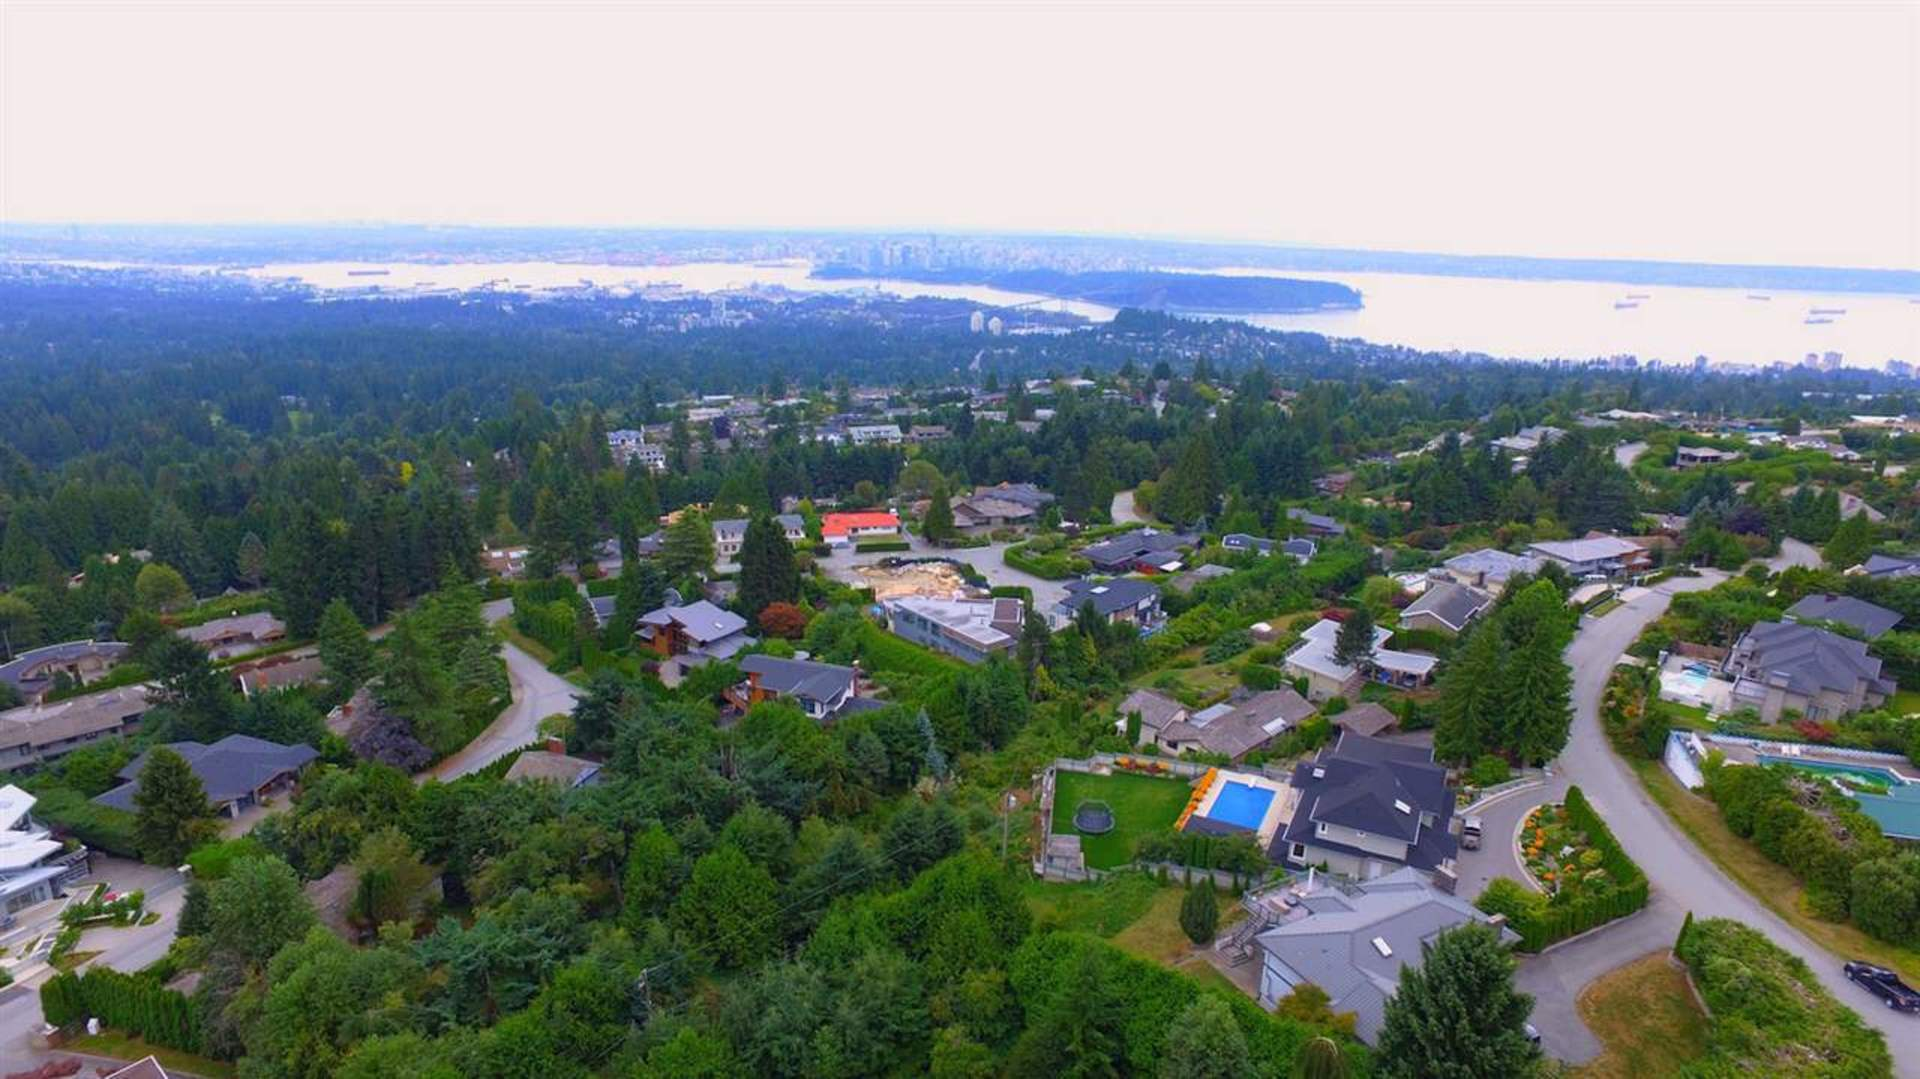 1070-crestline-road-british-properties-west-vancouver-02 at 1070 Crestline Road, British Properties, West Vancouver